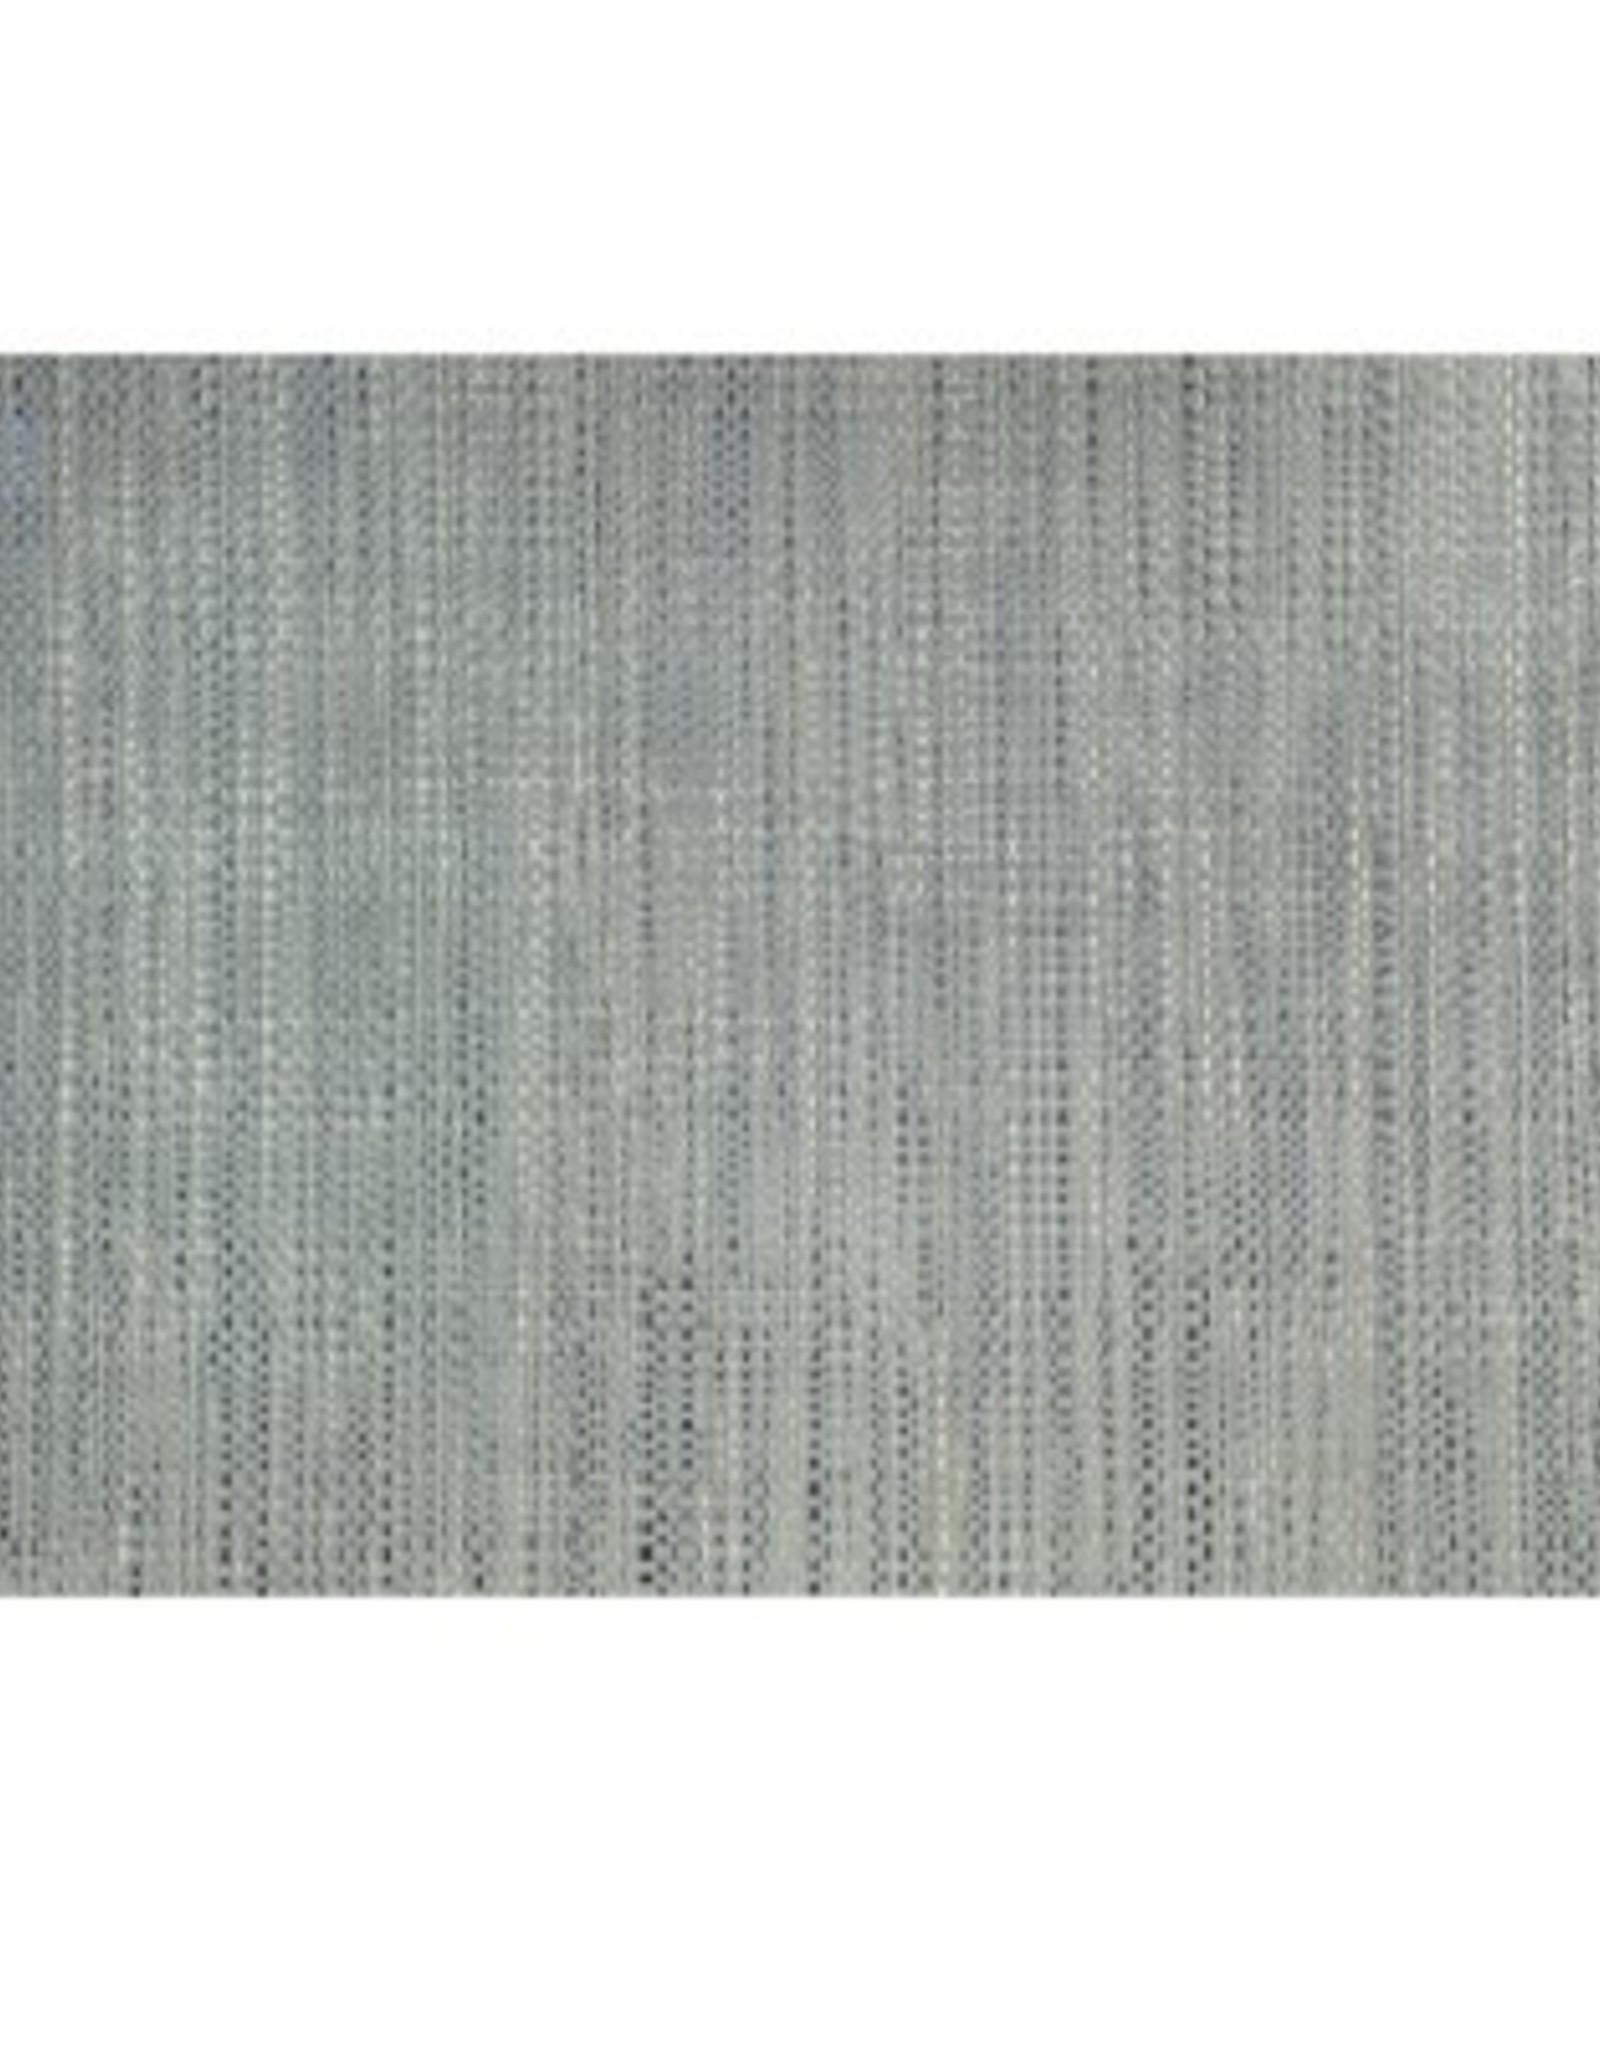 Placemat Harman Basketweave Trace 13 x 19 Grey 4987263